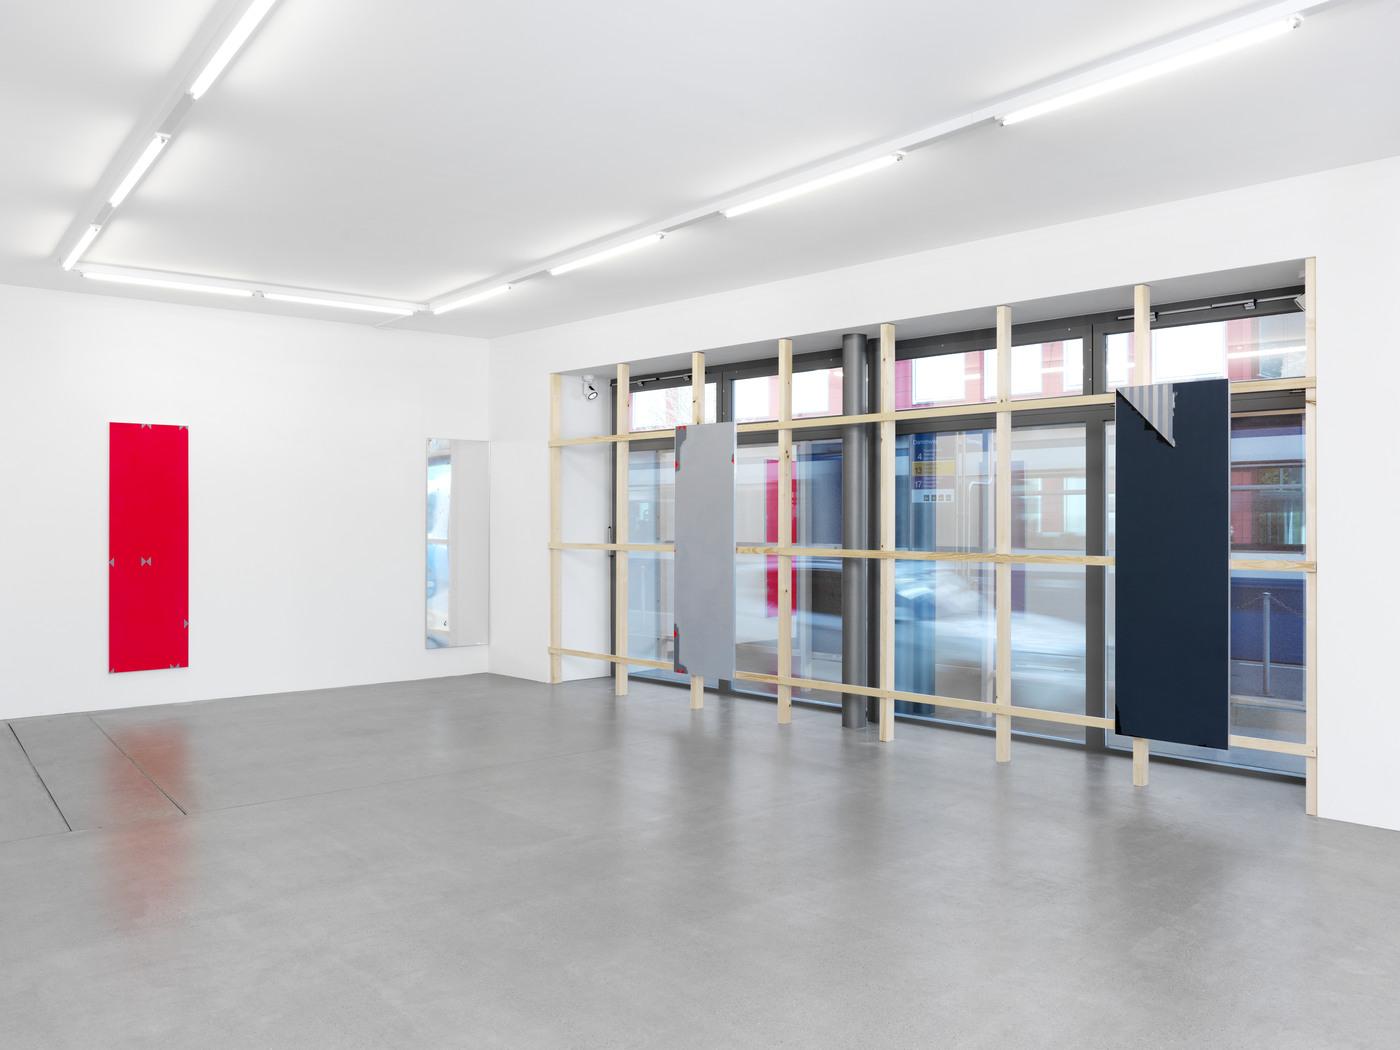 GMB_Oberthaler_InstallationImage_2